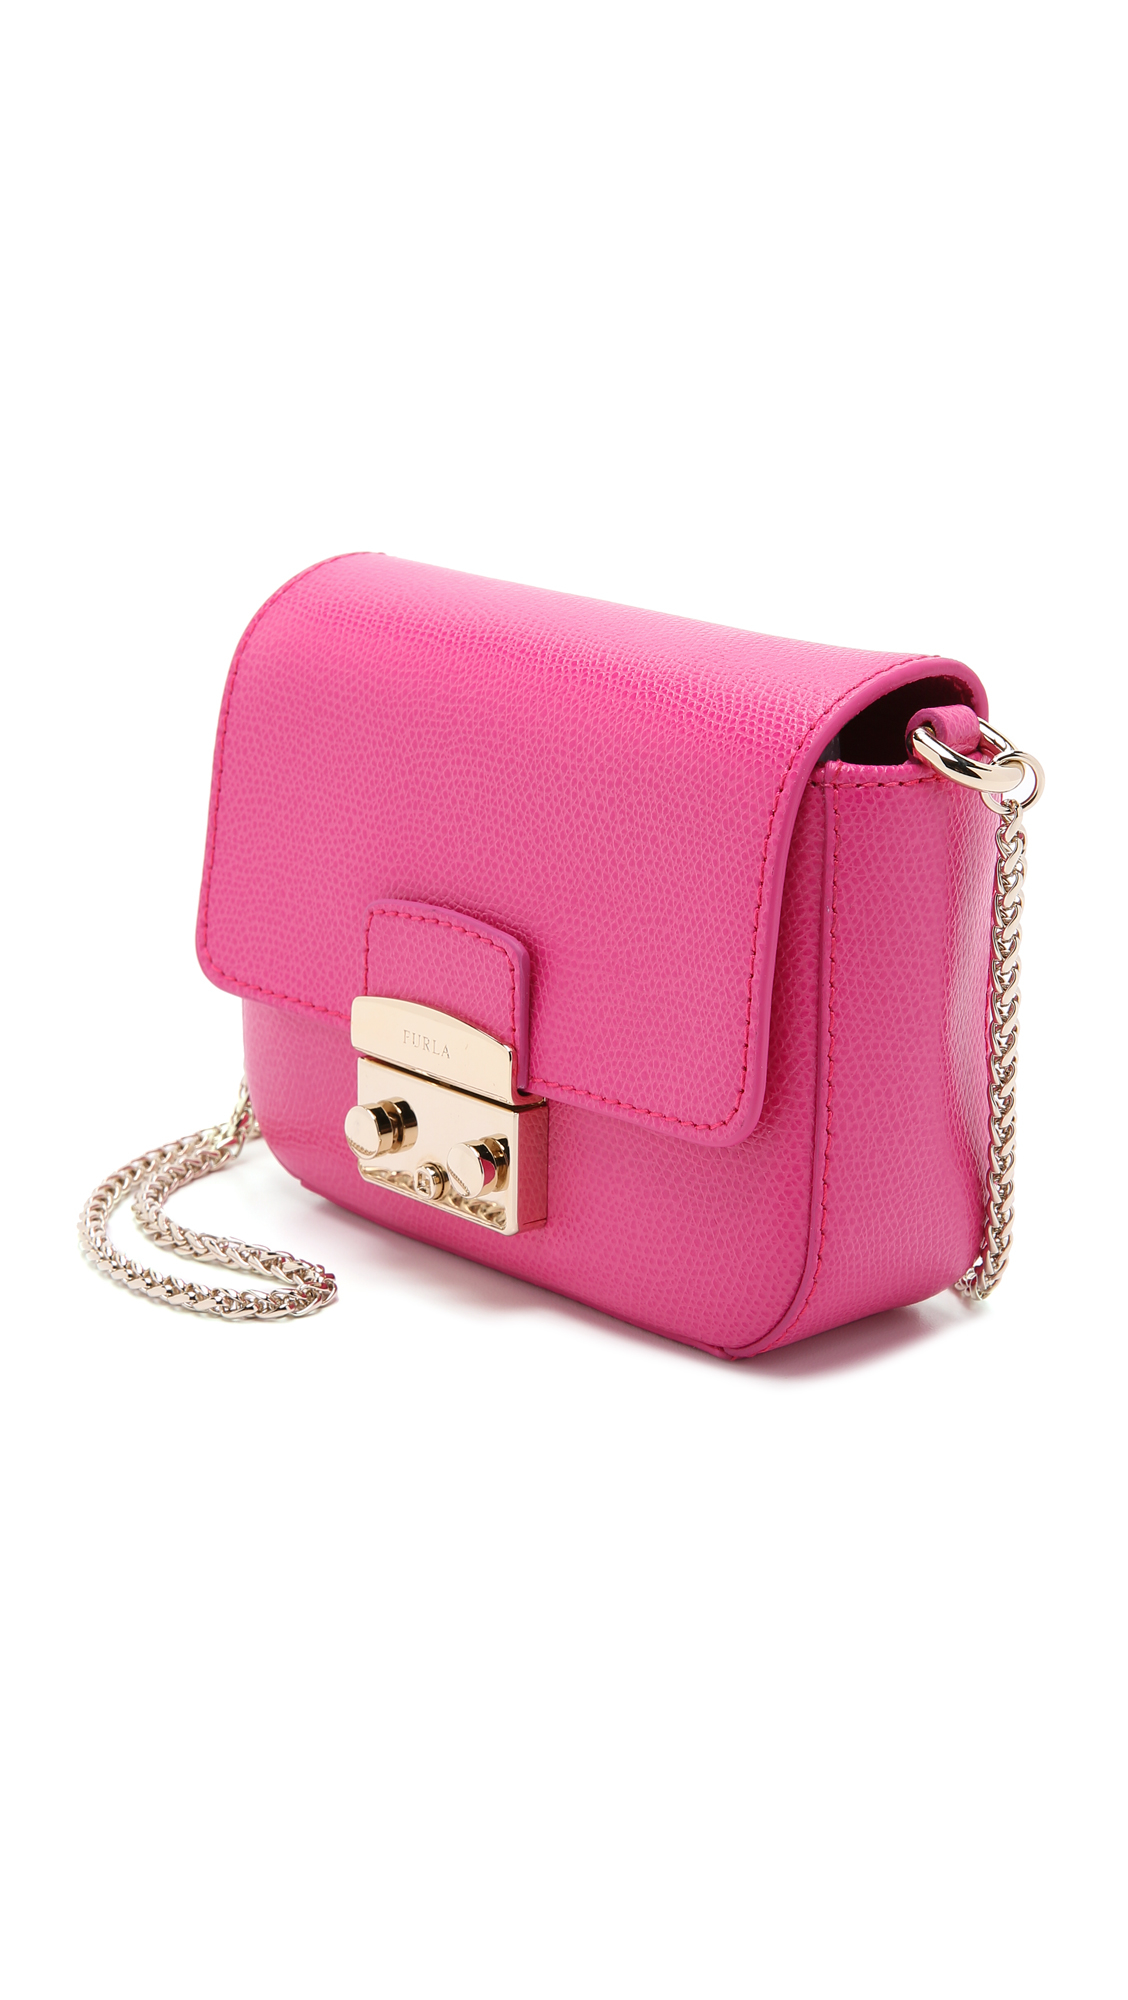 y Bag Mini Metropolis Cross Furla púrpura Body rosa w64q6